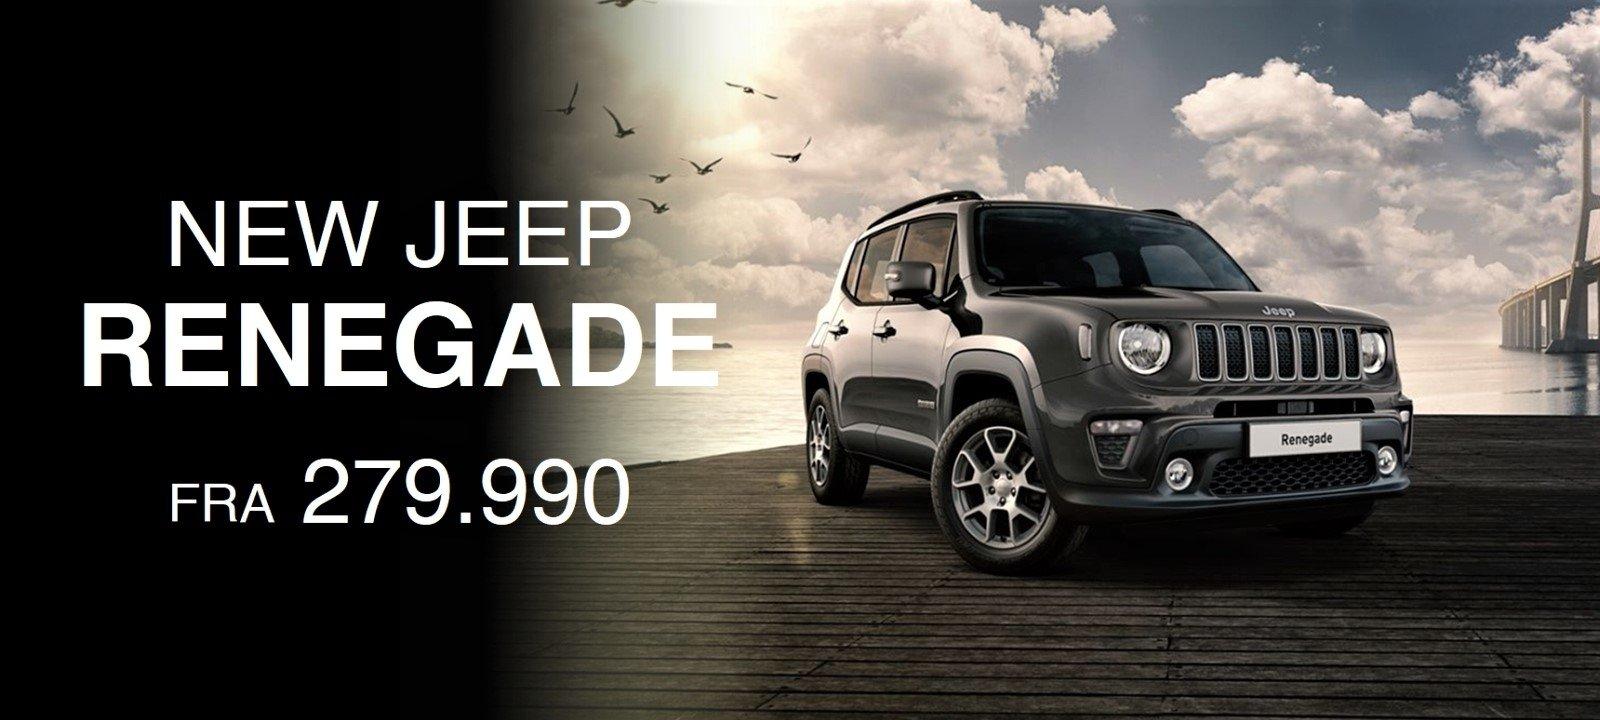 Ny Jeep Renegade hos FJ Biler